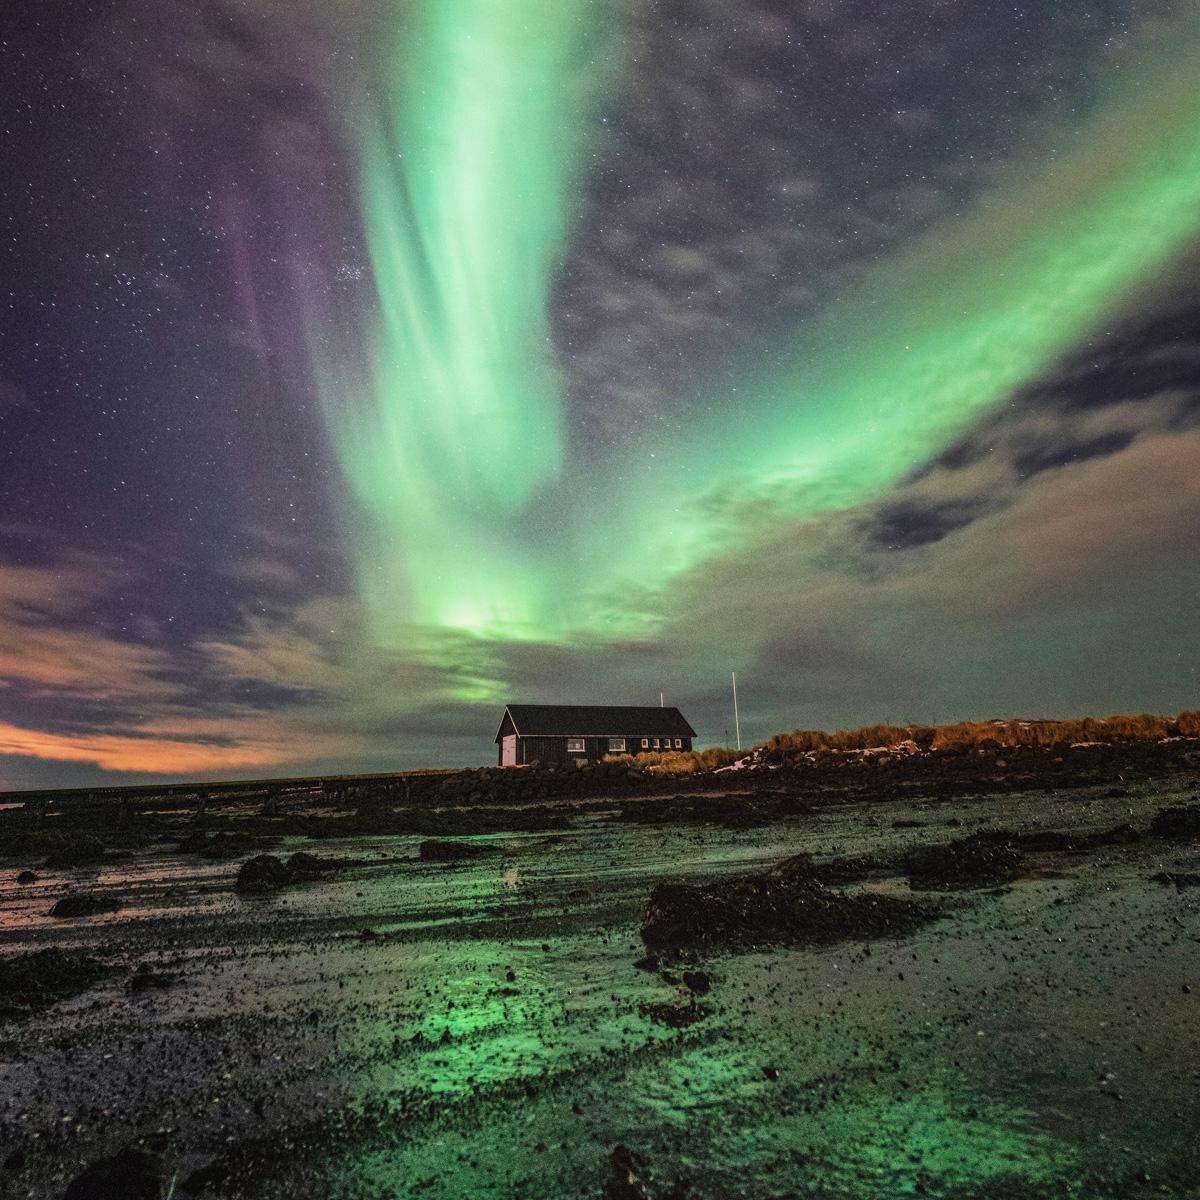 Island © Neil Thomas | unsplash